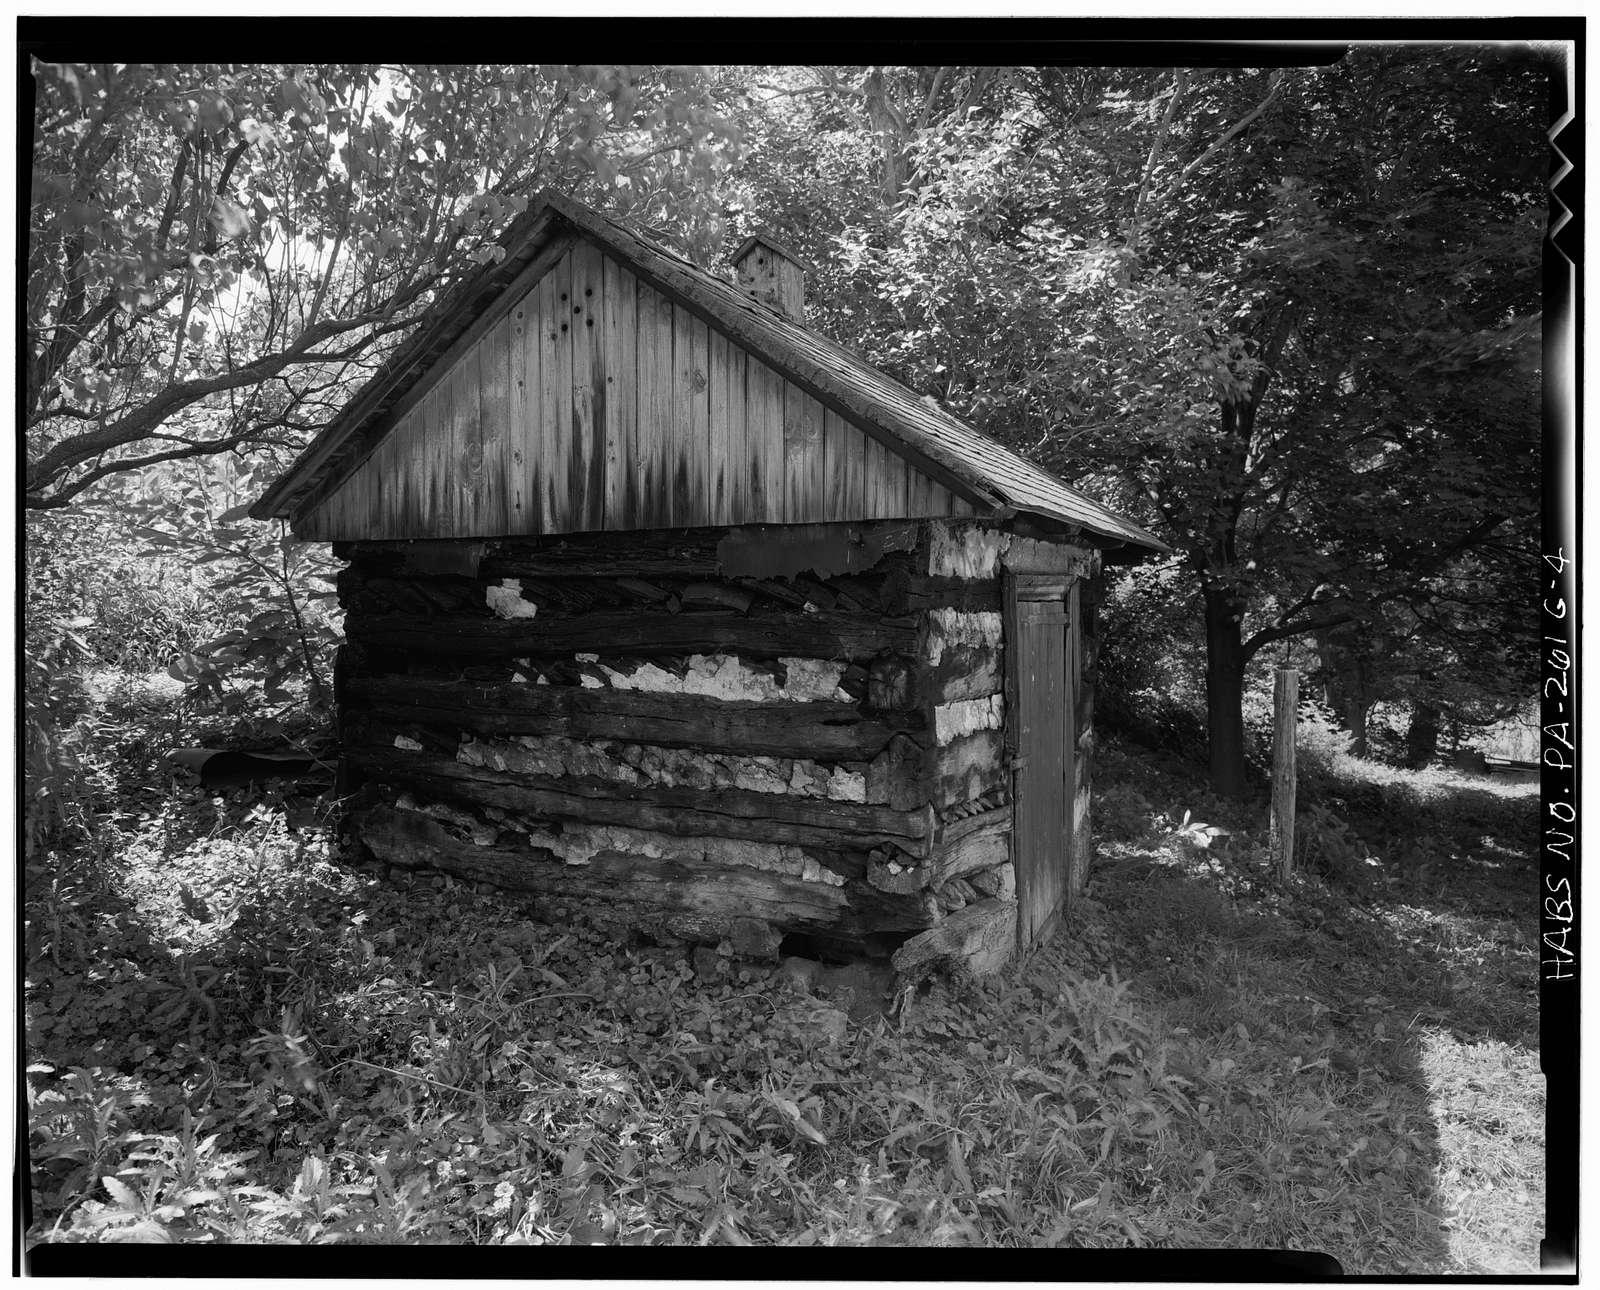 Dundore Farm, Smokehouse, State Route 183 vicinty (Penn Township), Mount Pleasant, Berks County, PA